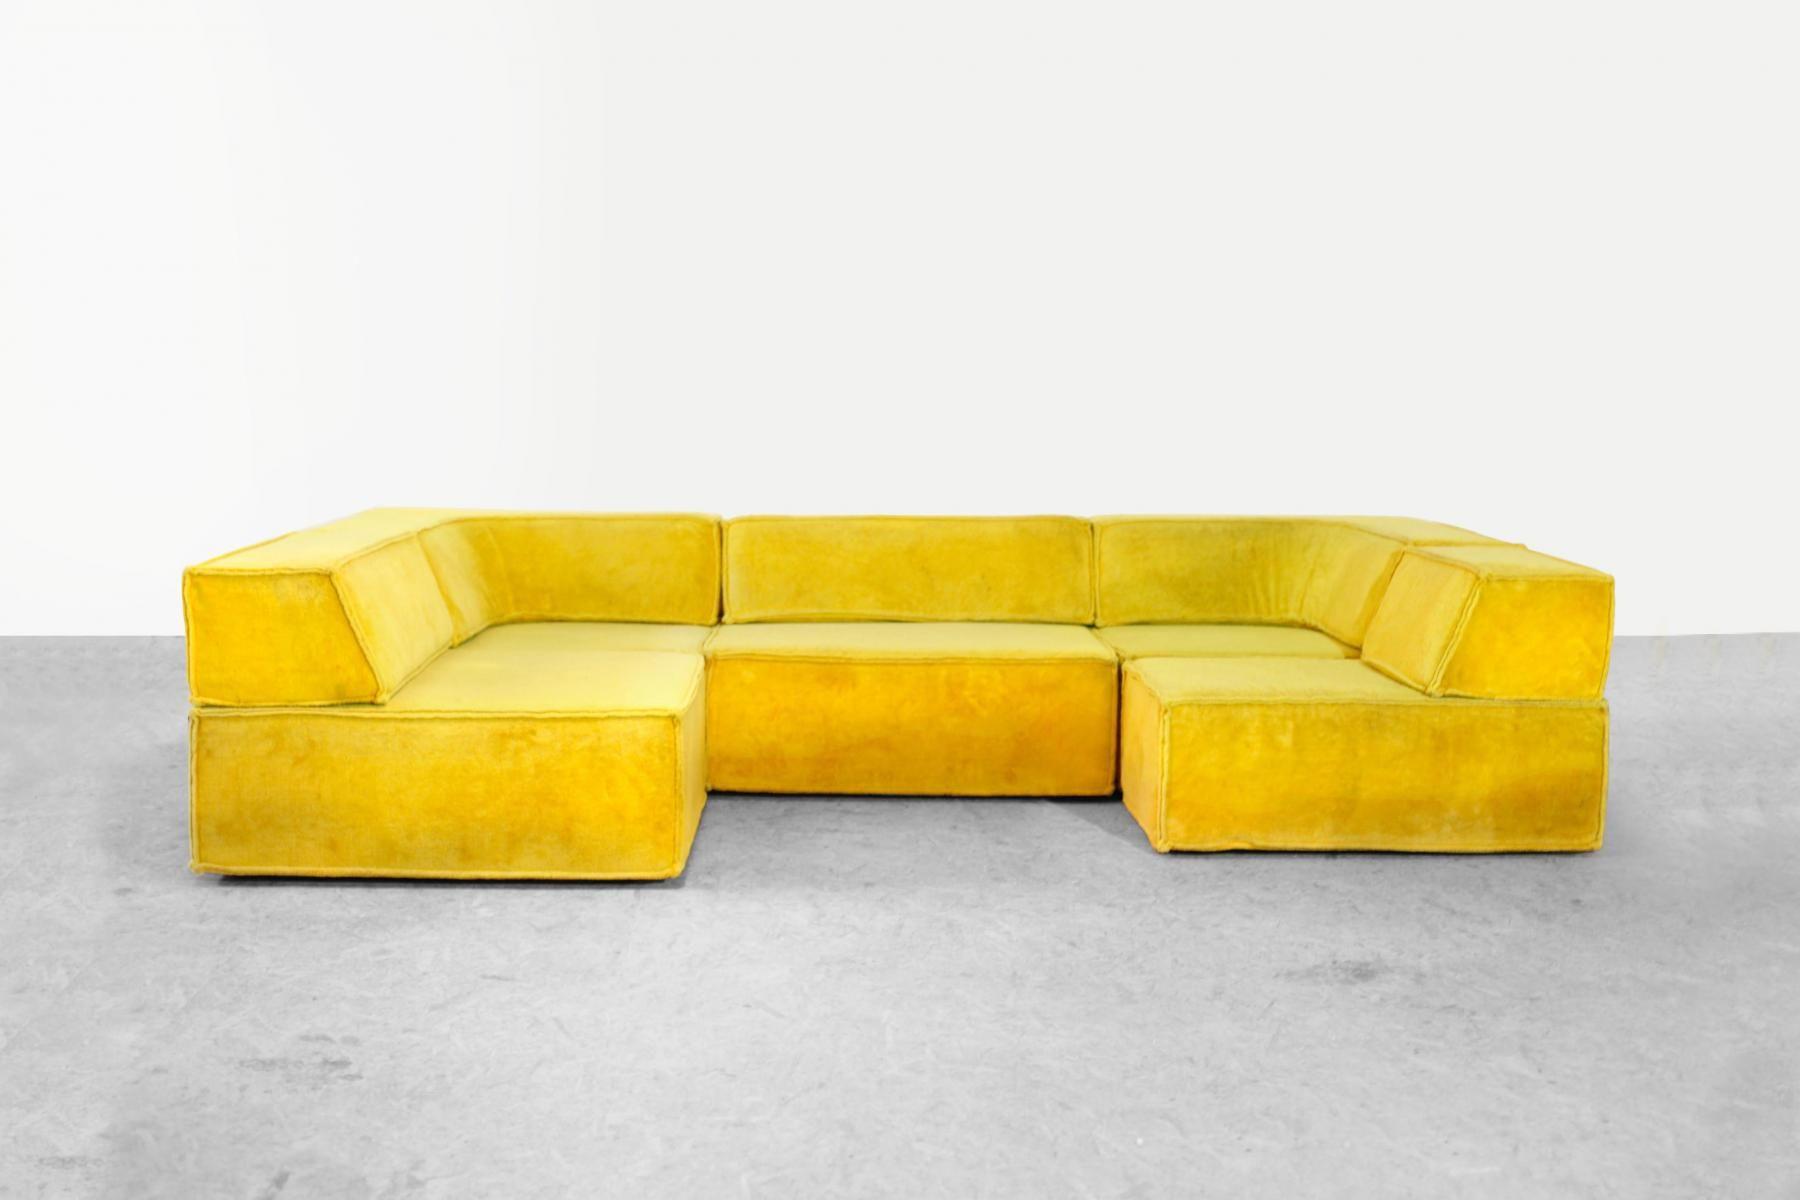 Vintage Modular Trio Sofa By Team Form Ag For Cor,